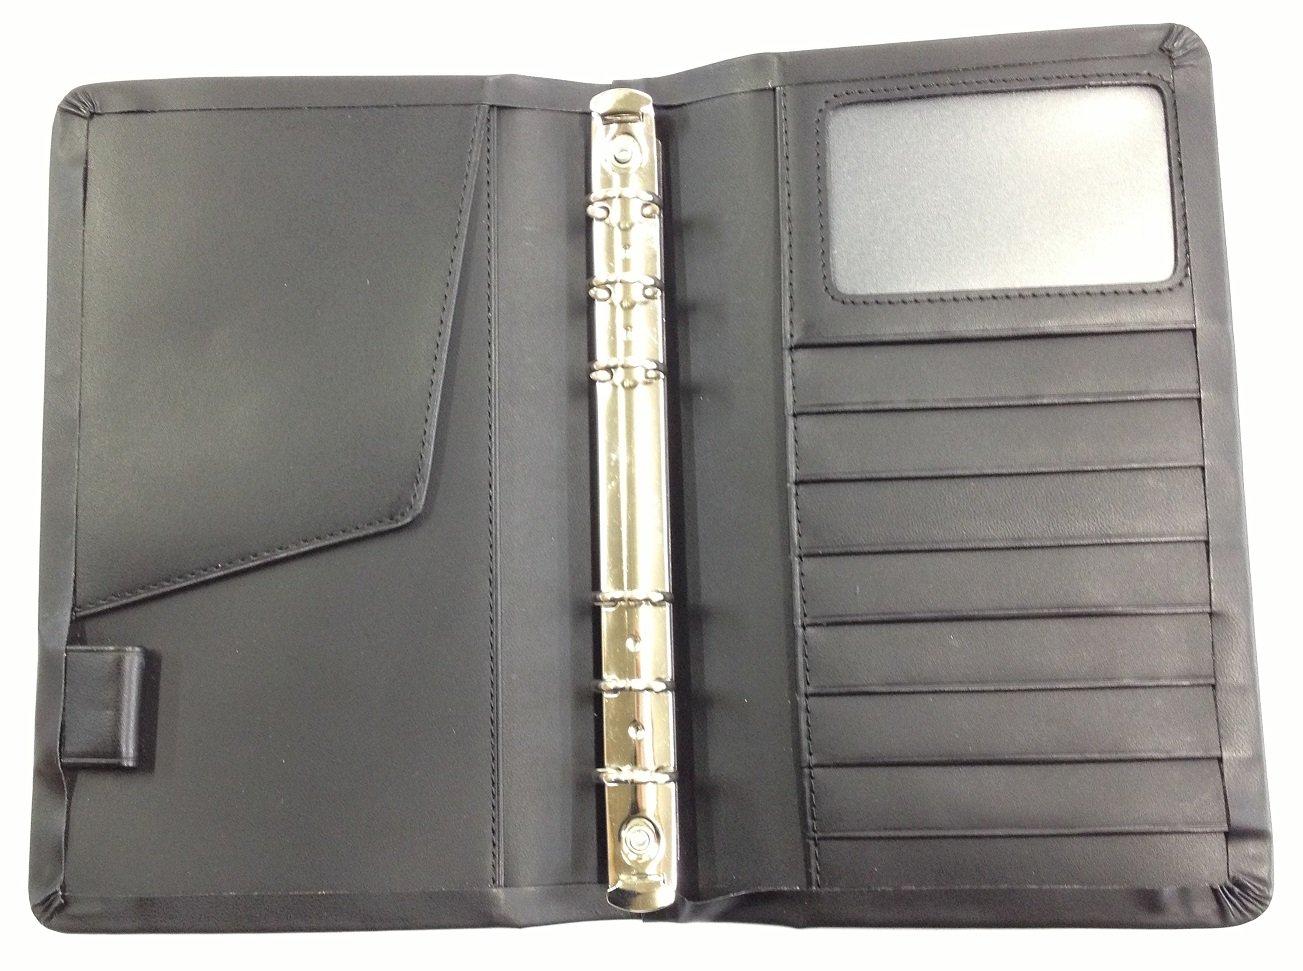 A6 Liner Diary Organiser